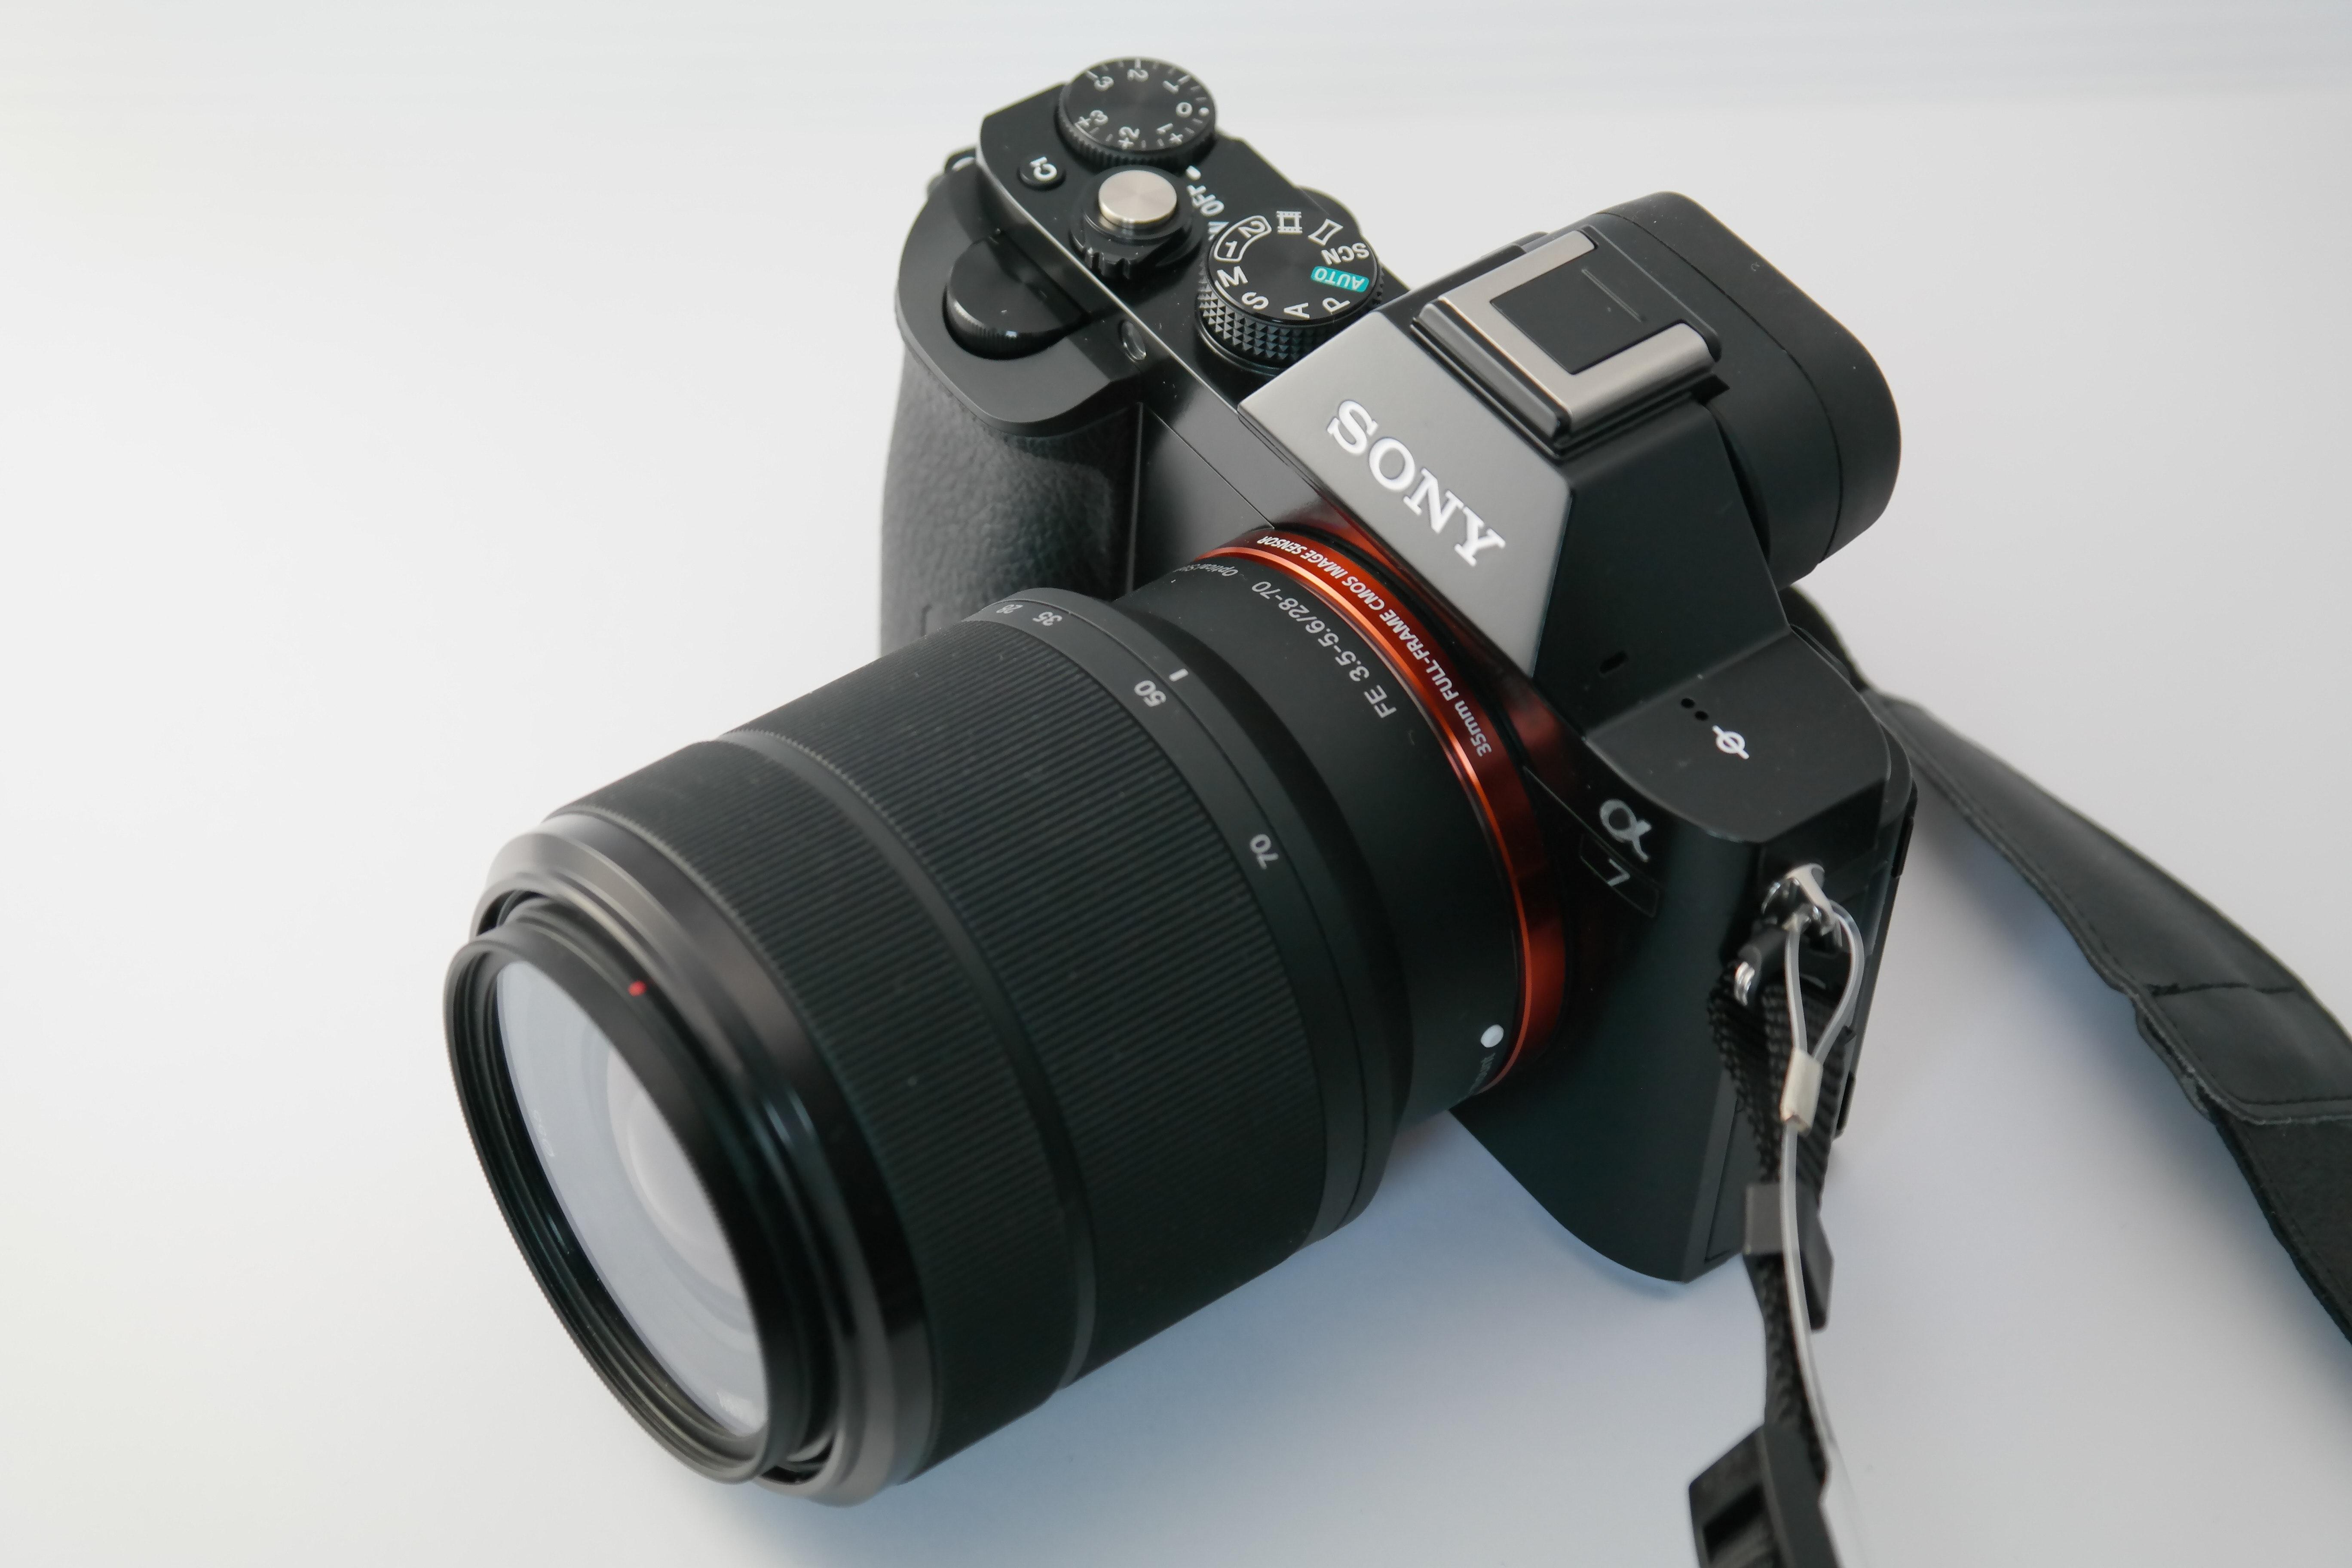 black sony dslr camera on white surface free stock photo